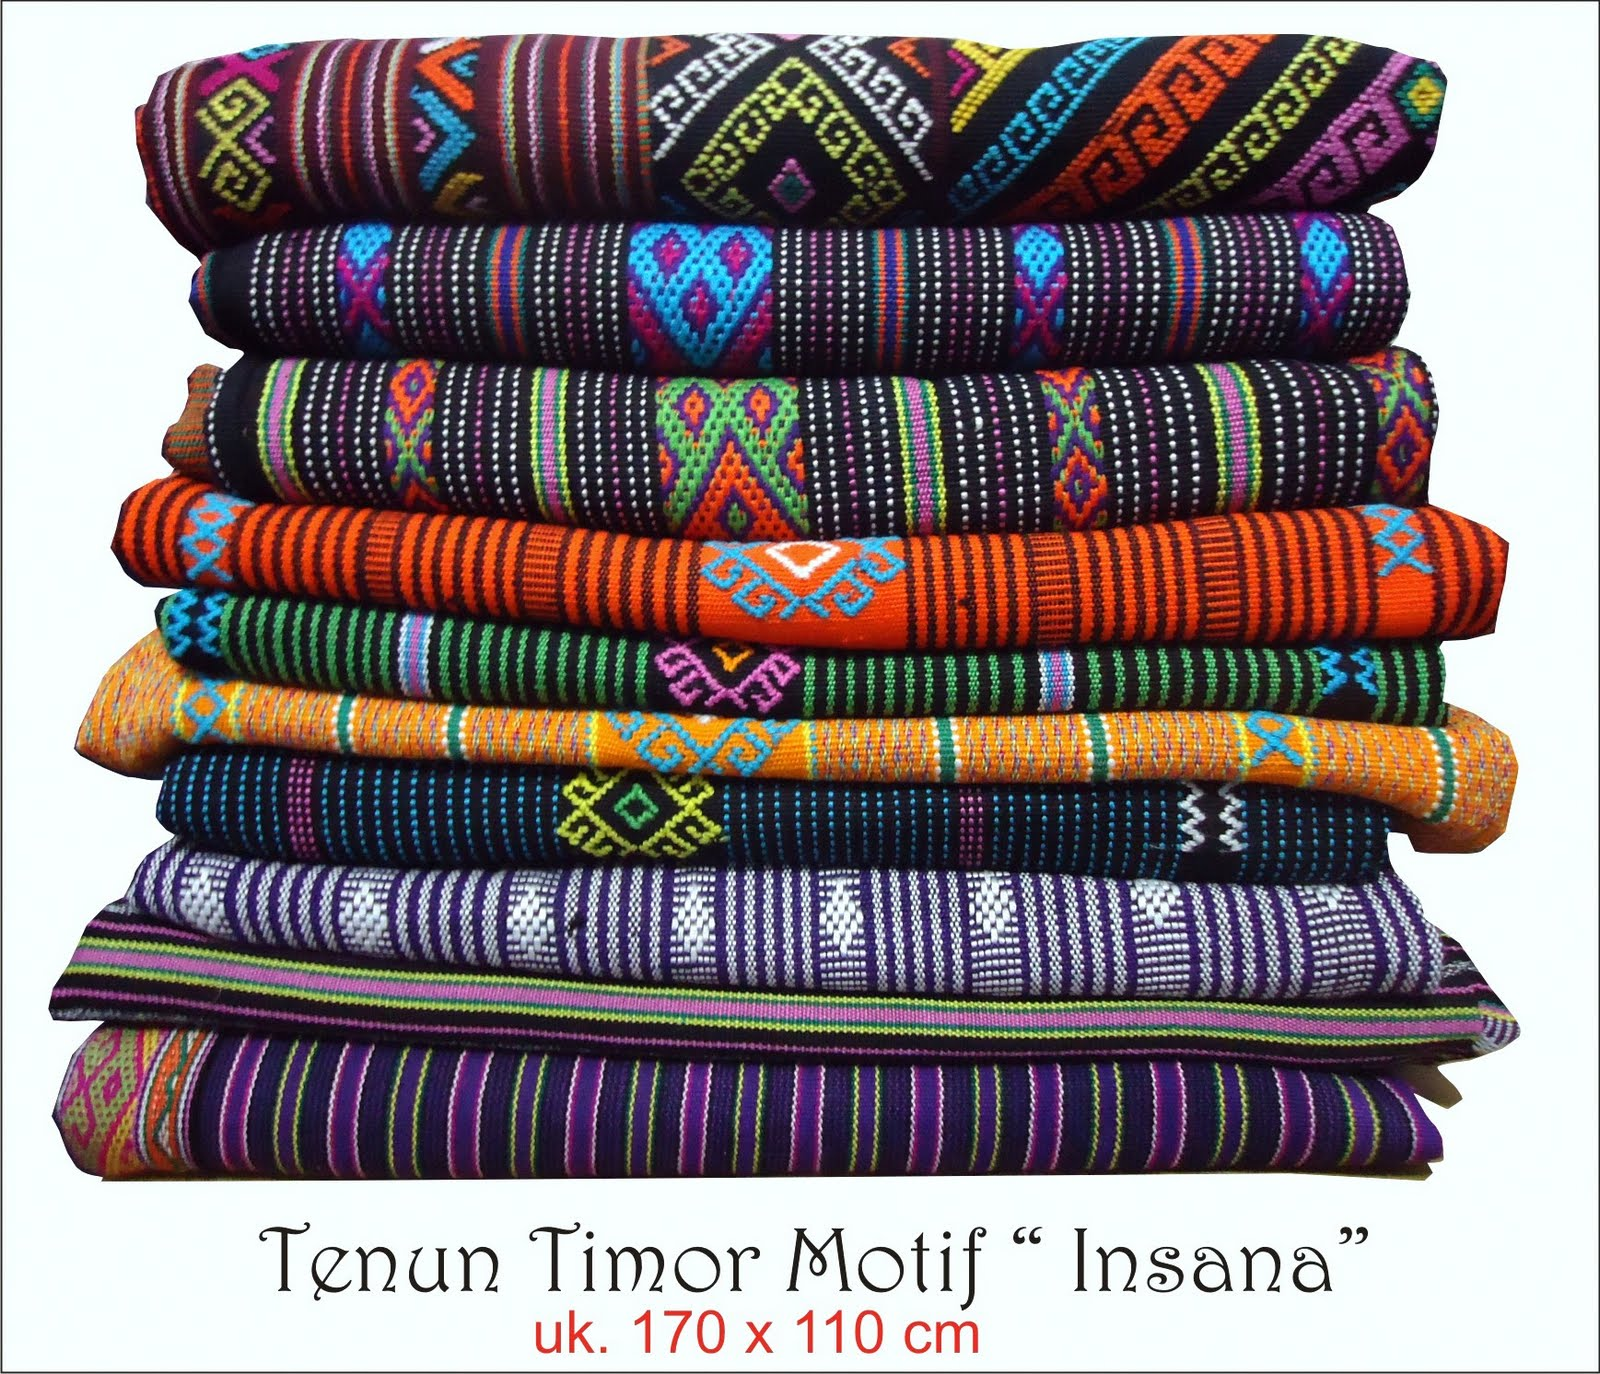 http://4.bp.blogspot.com/-bWemT9flnZE/TnC4Wdonw8I/AAAAAAAACZc/6mL-KL6YjyI/s1600/kain-Tenun-timor-Insana.jpg